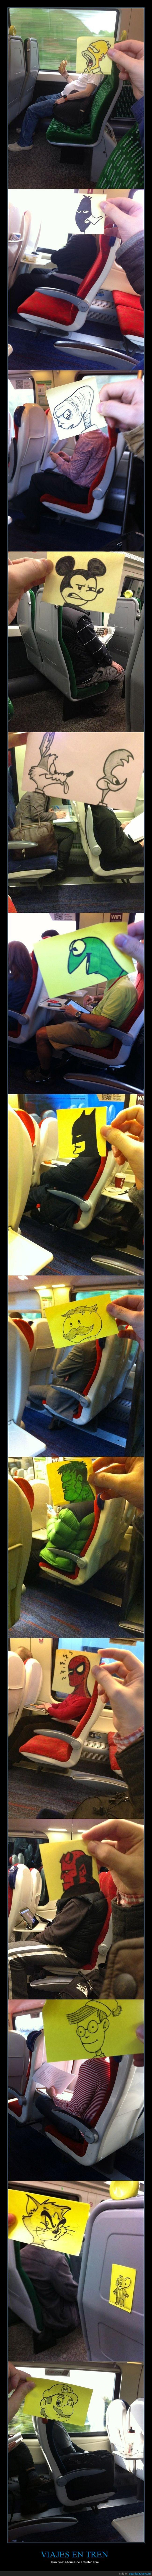 dibujos,entretenerse,tren,viejes